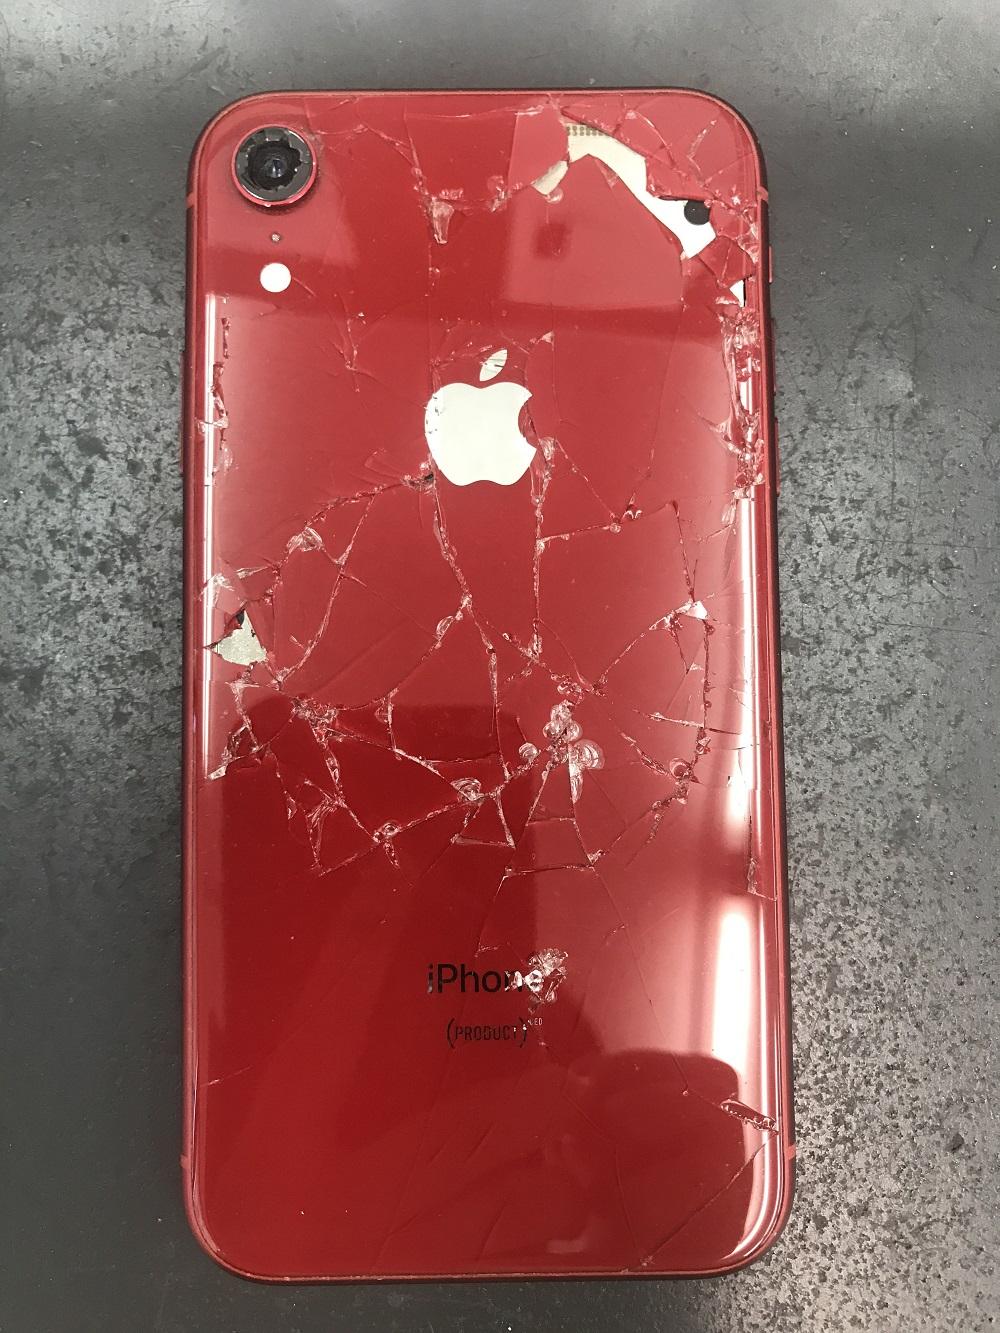 iPhoneXRのバッテリー交換